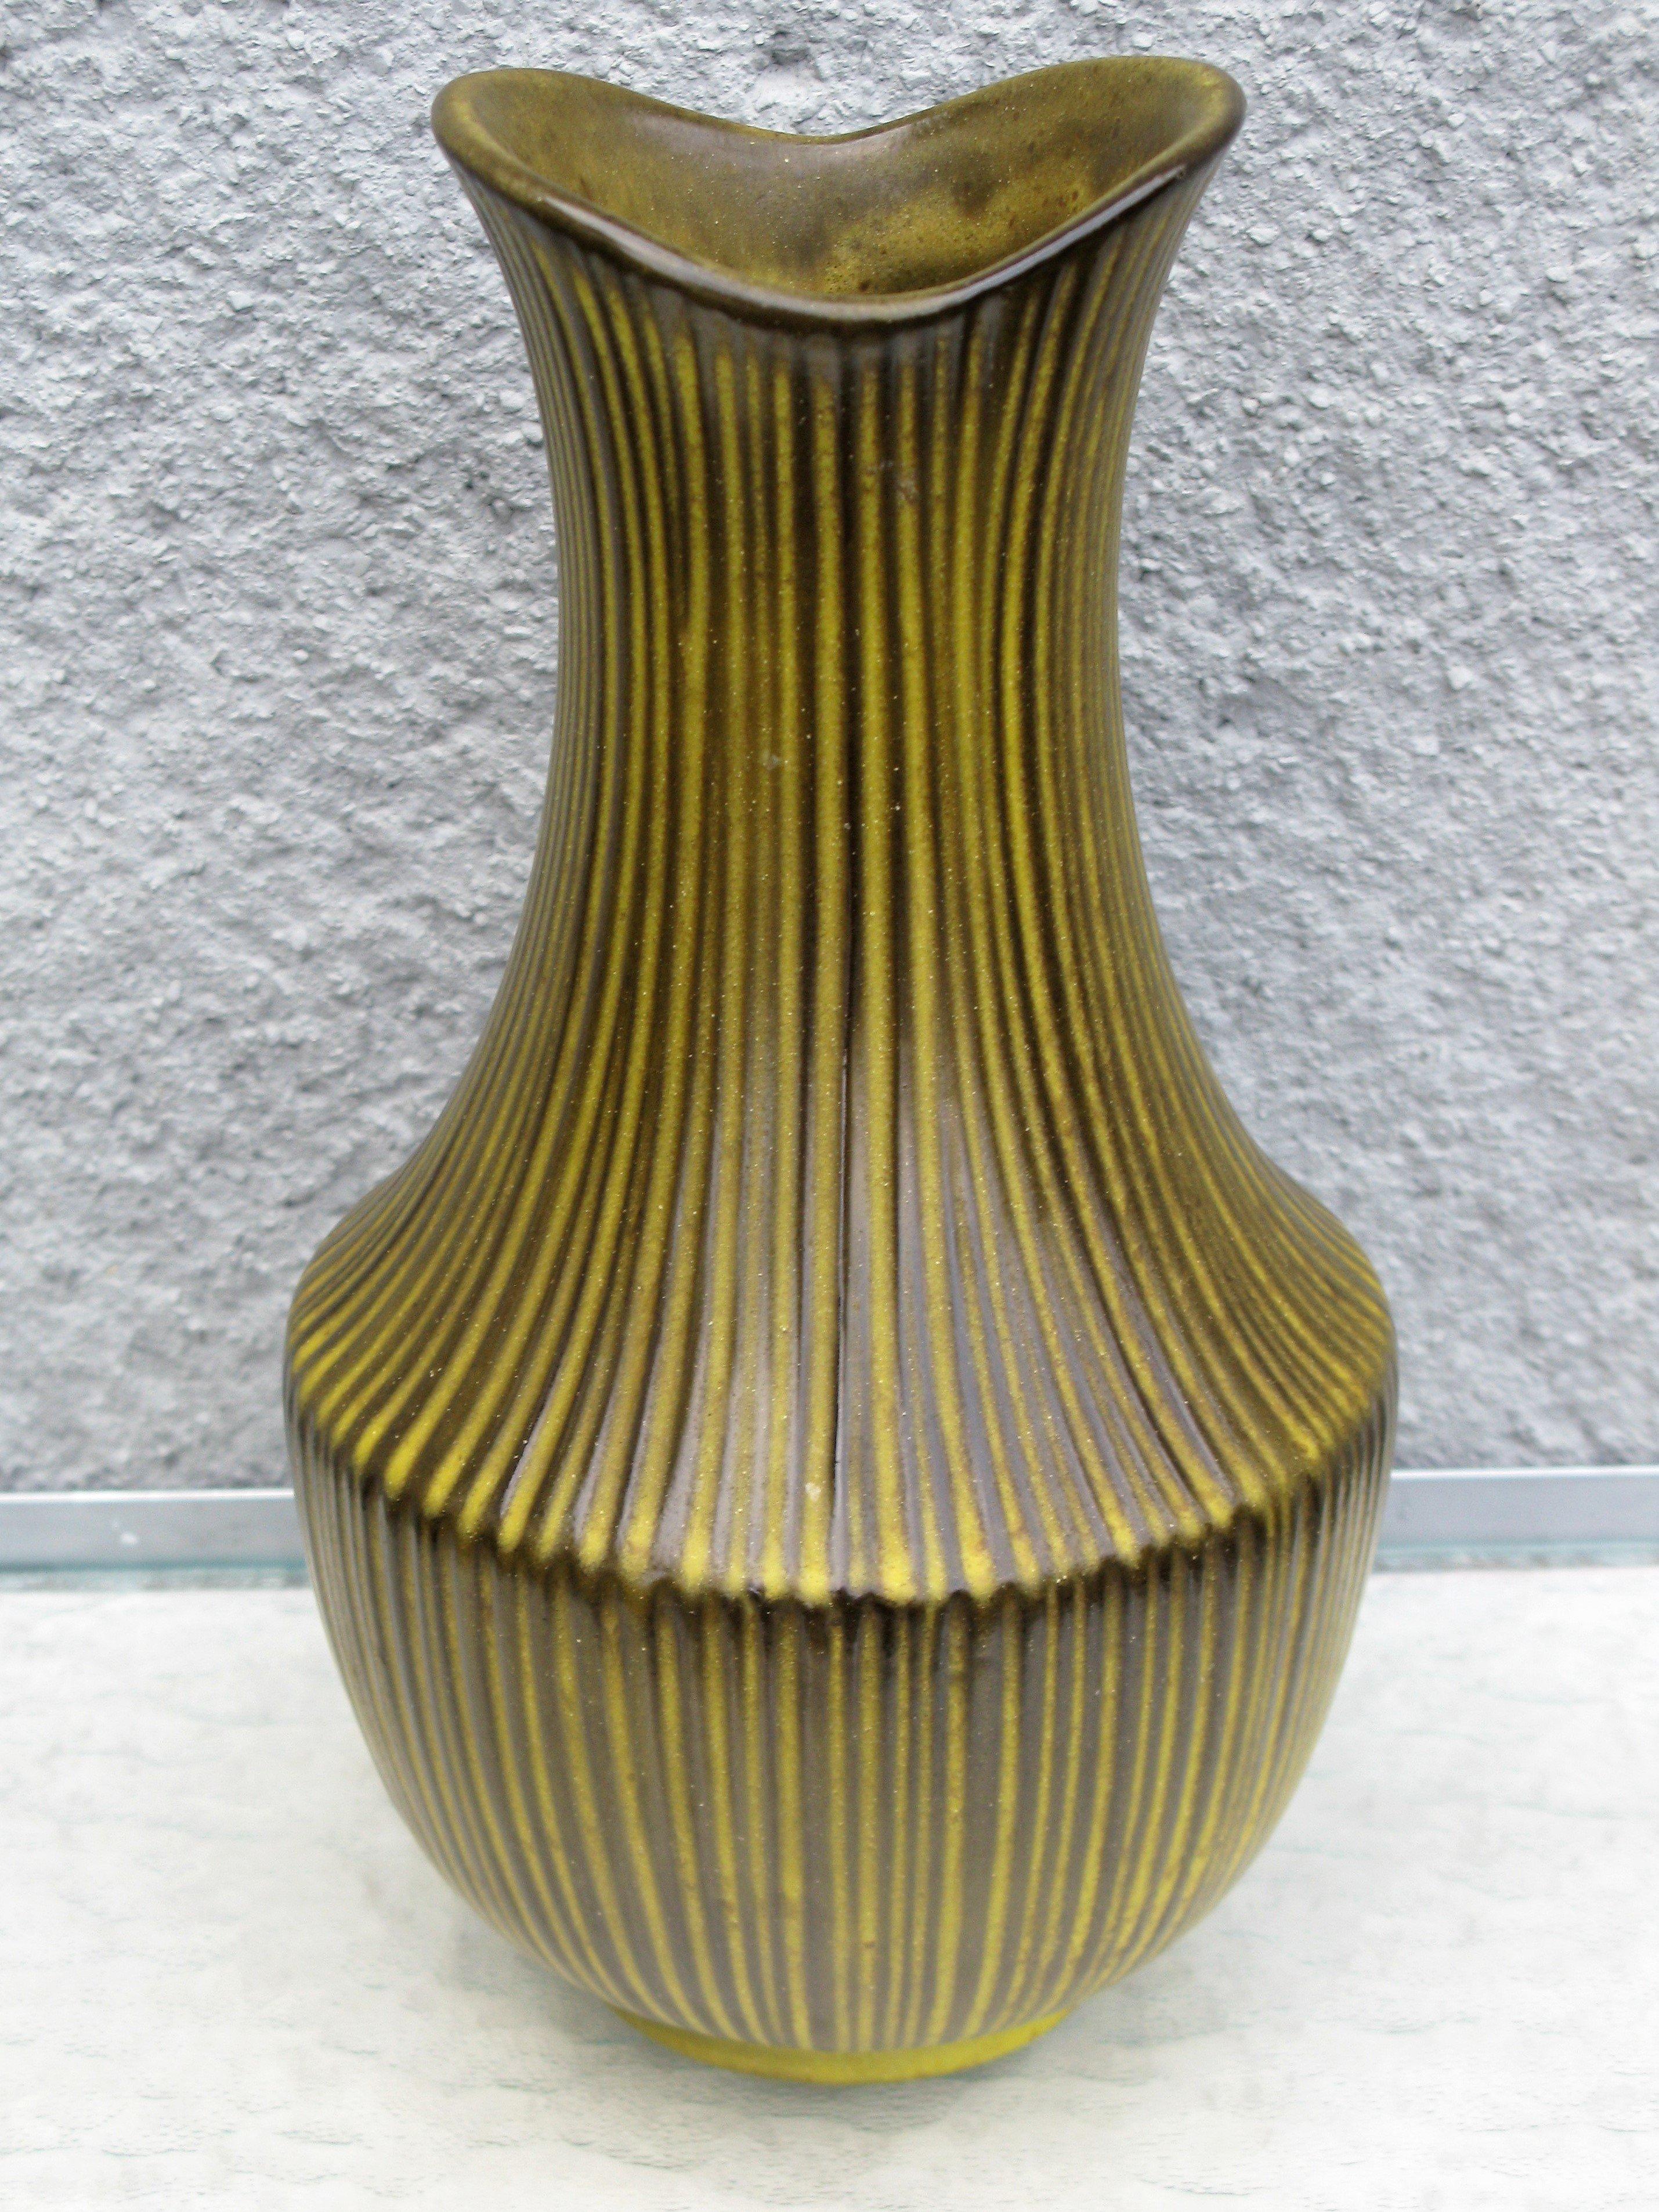 amarillo vase 9013s